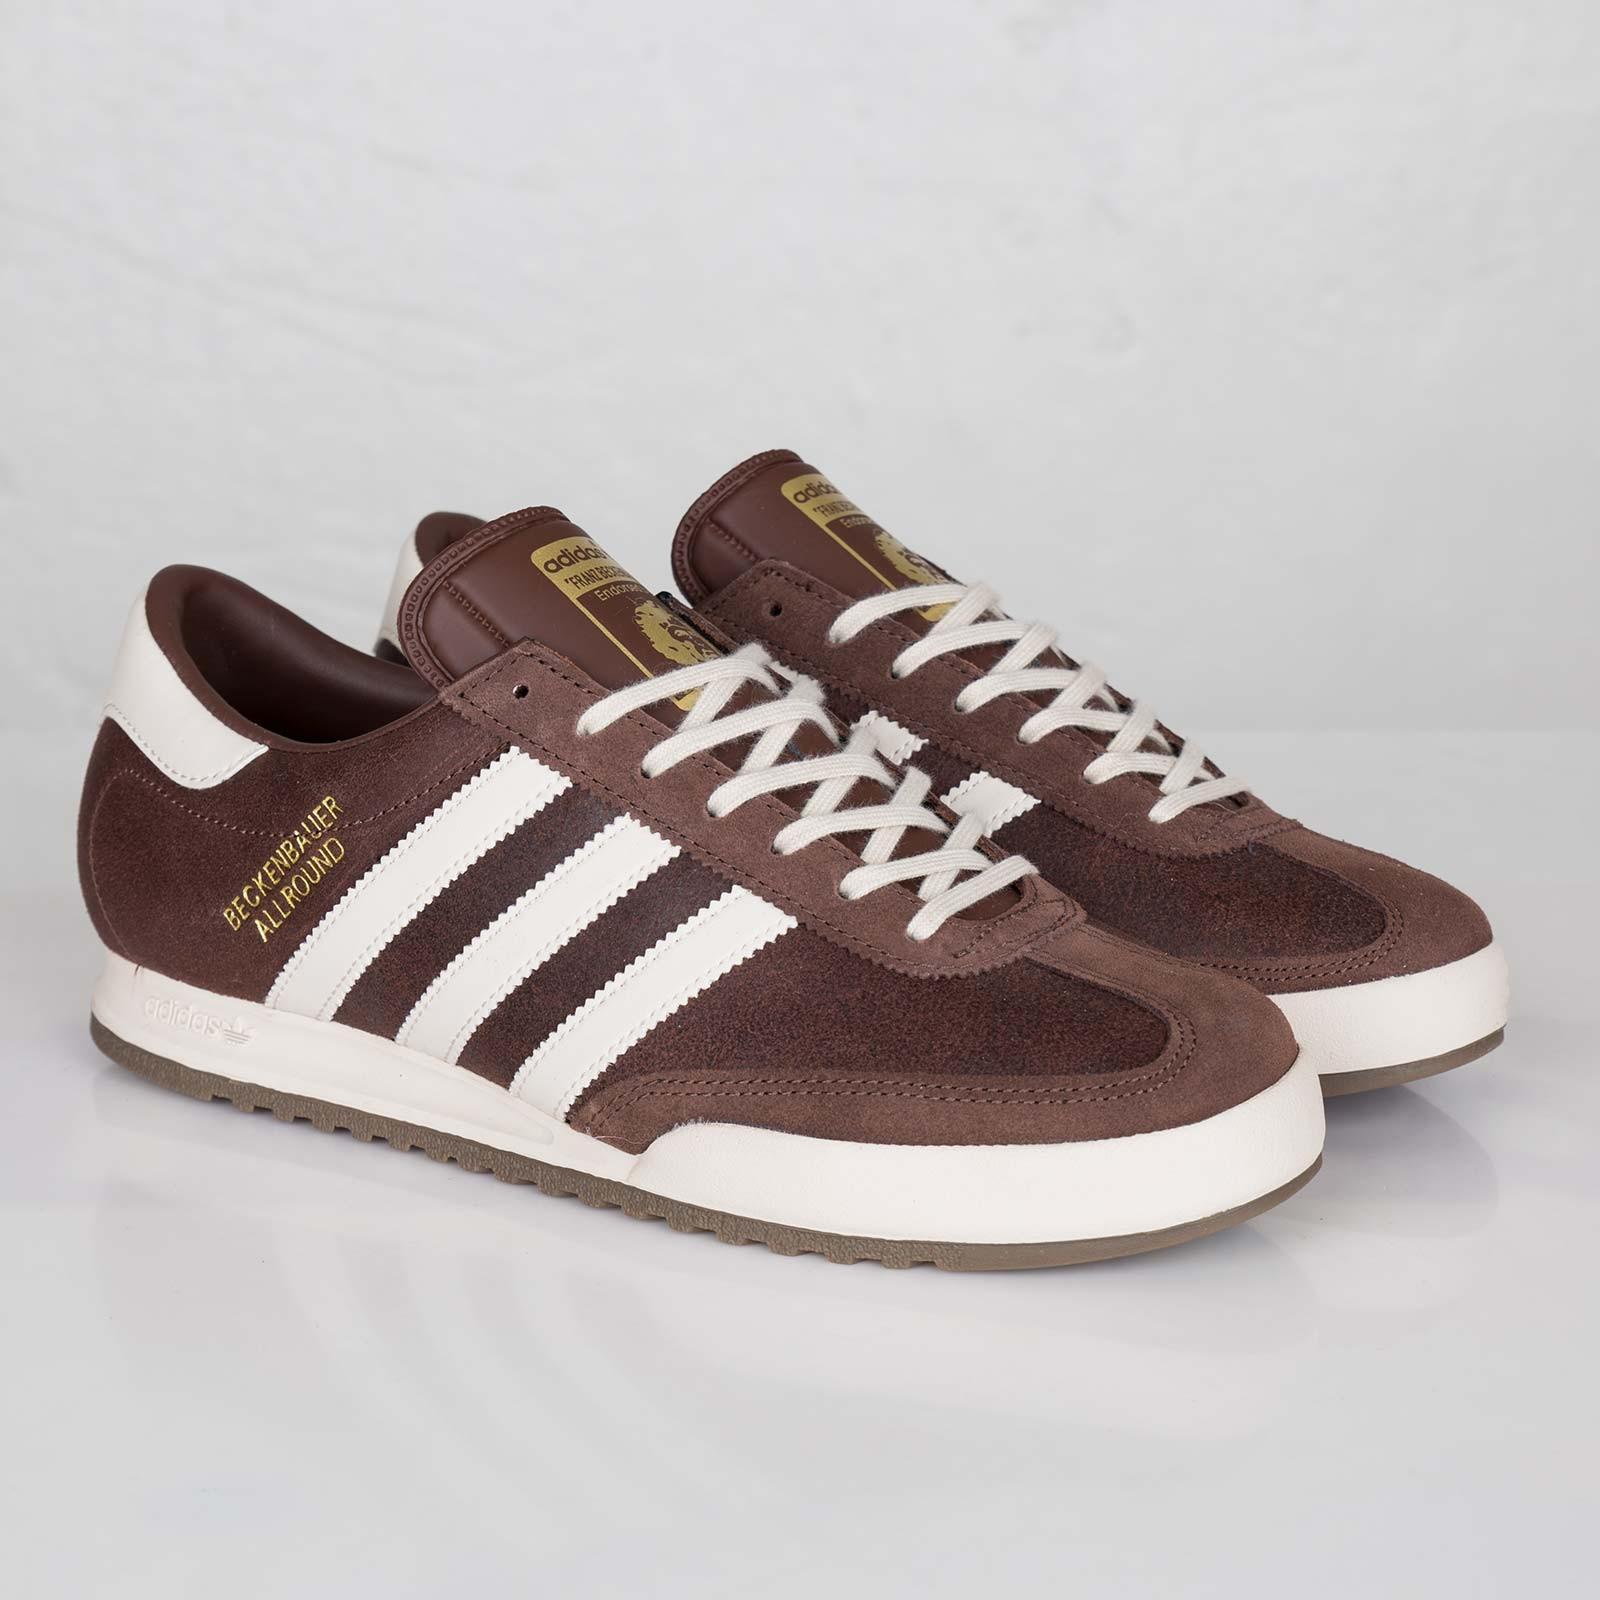 adidas beckenbauer shoes brown; adidas beckenbauer allround shoes ... DVRQWZE